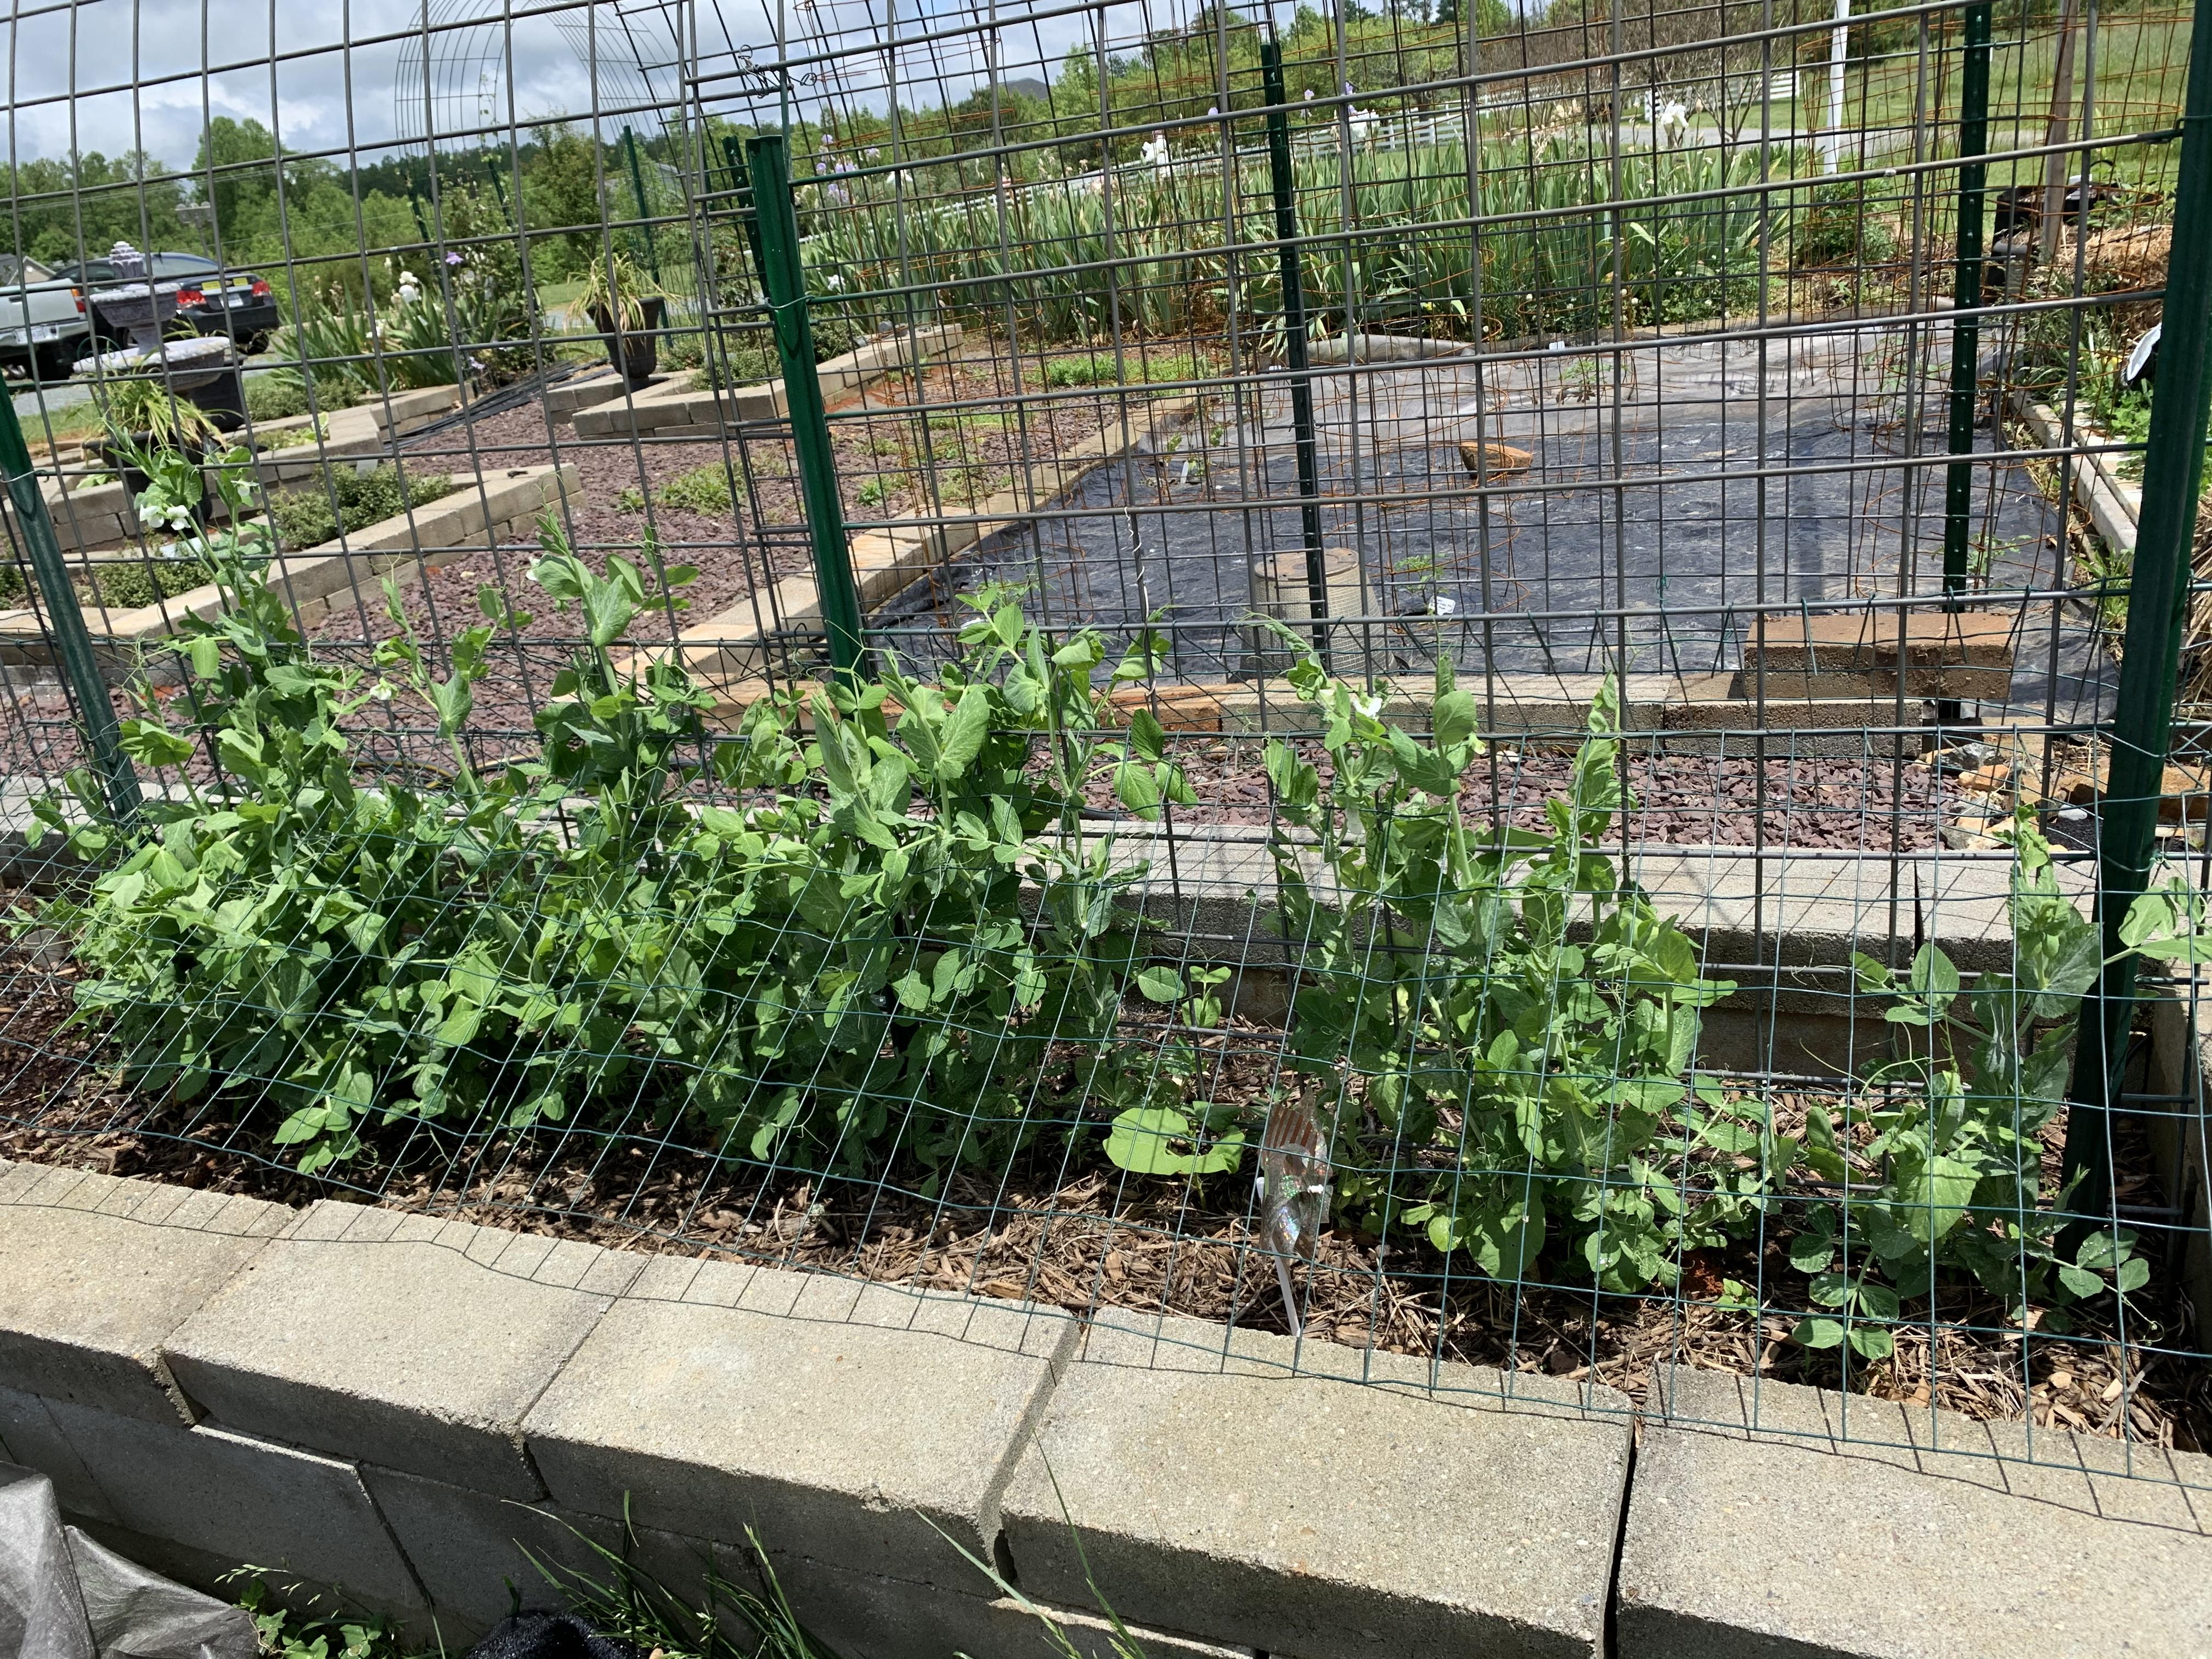 7BBB52D4 E2C4 4893 944D A8F3EBC0608C Cucumbers planted!